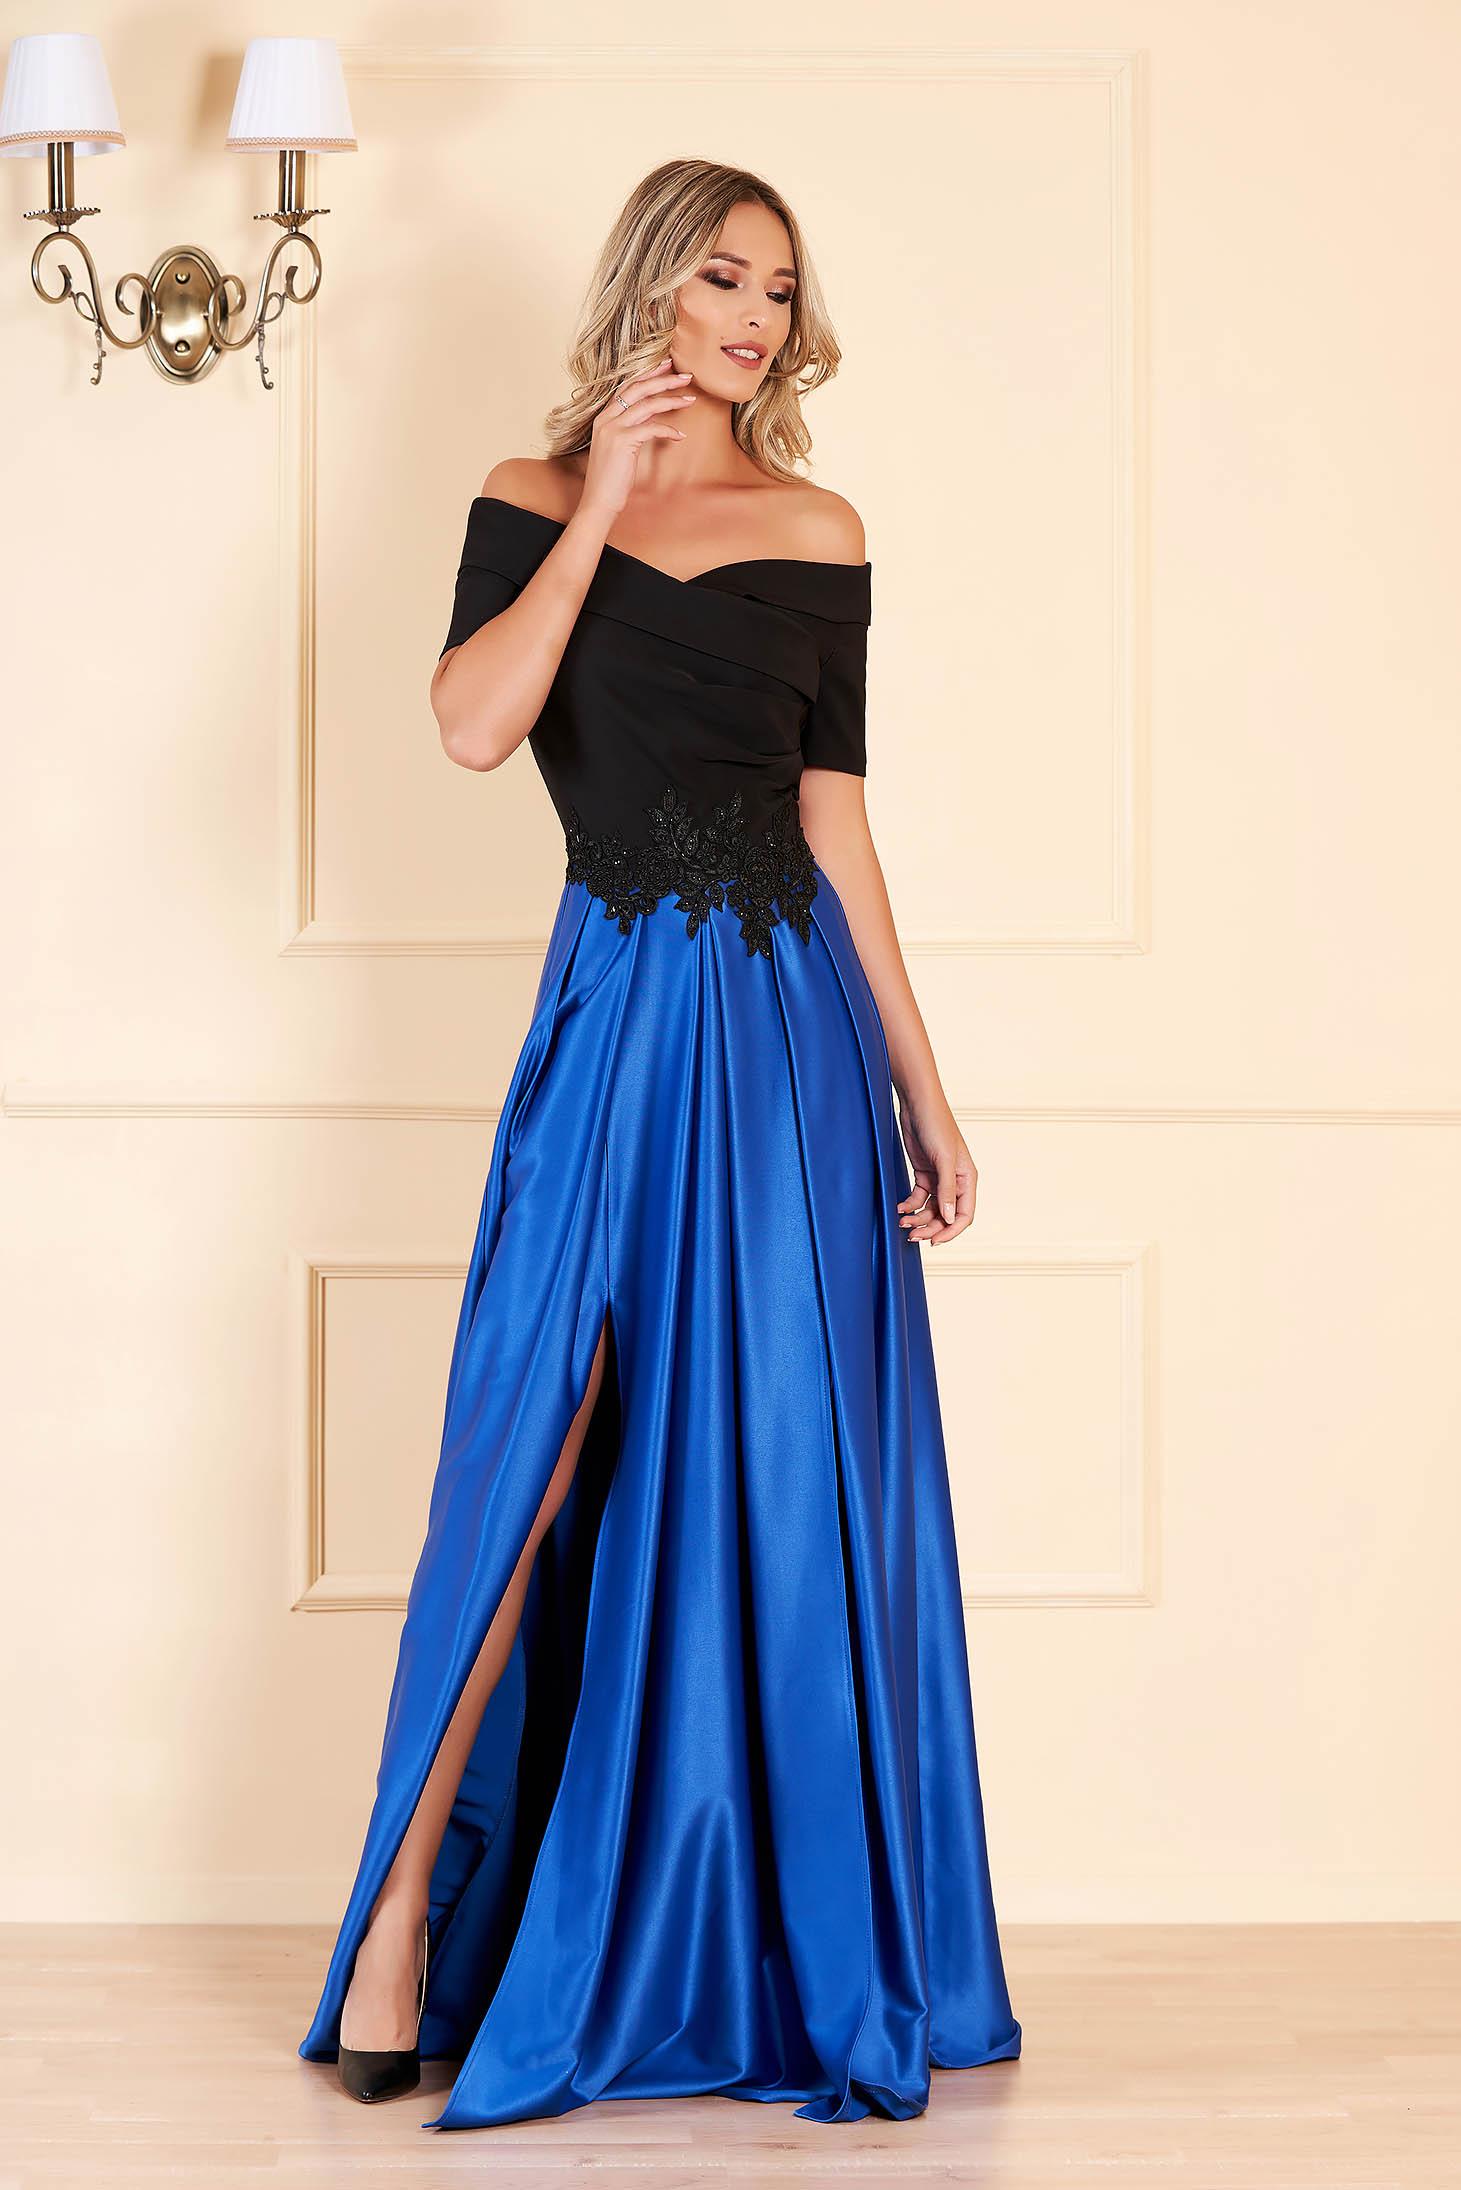 Rochie albastra de ocazie in clos pe umeri din material satinat cu insertii de broderie